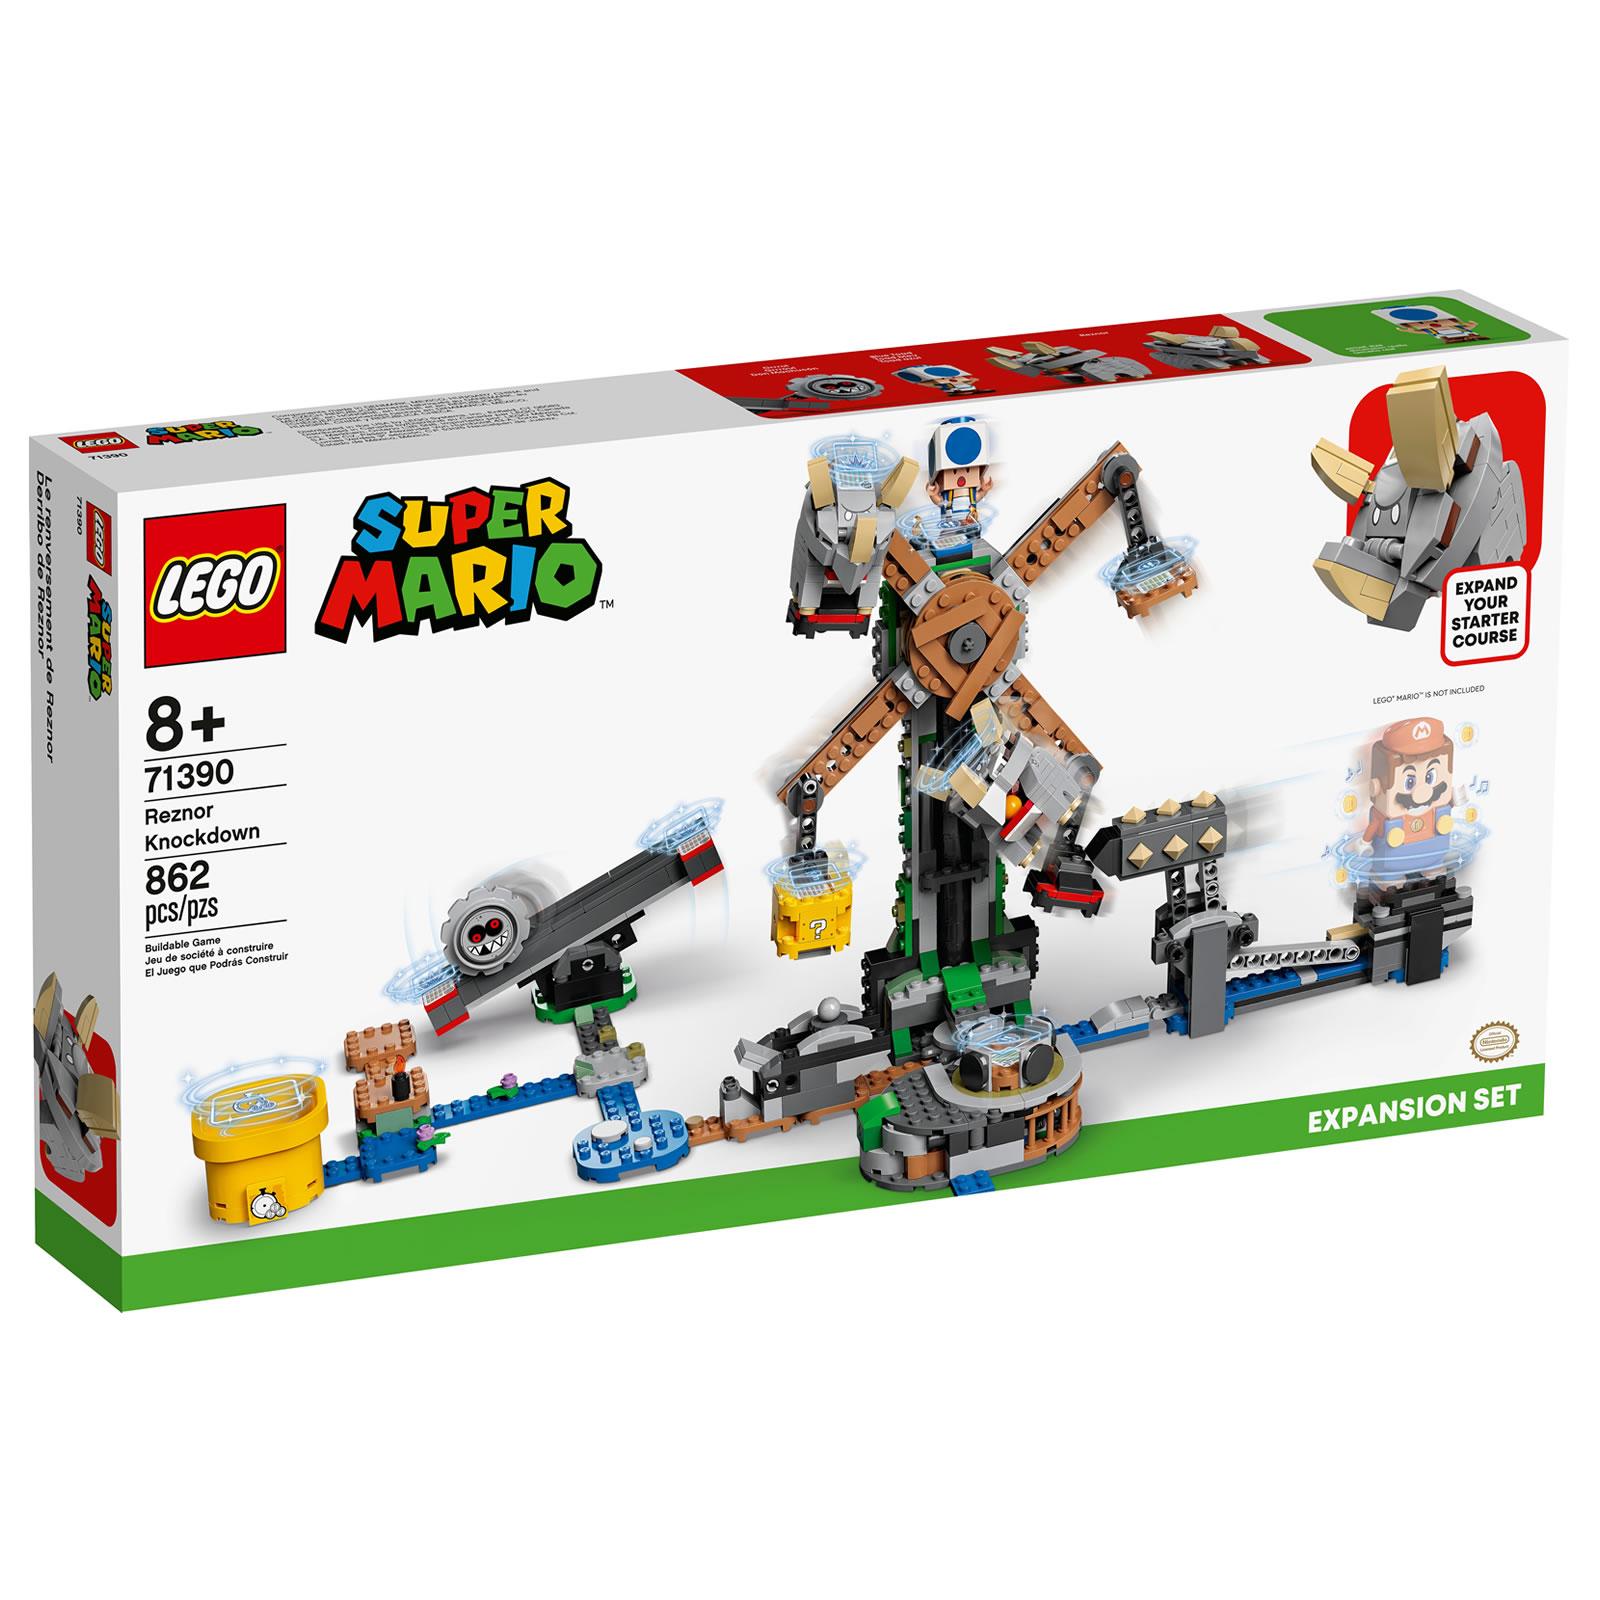 Nintendo s'associe avec LEGO ! - Page 5 71390-lego-super-mario-reznor-knockdown-1